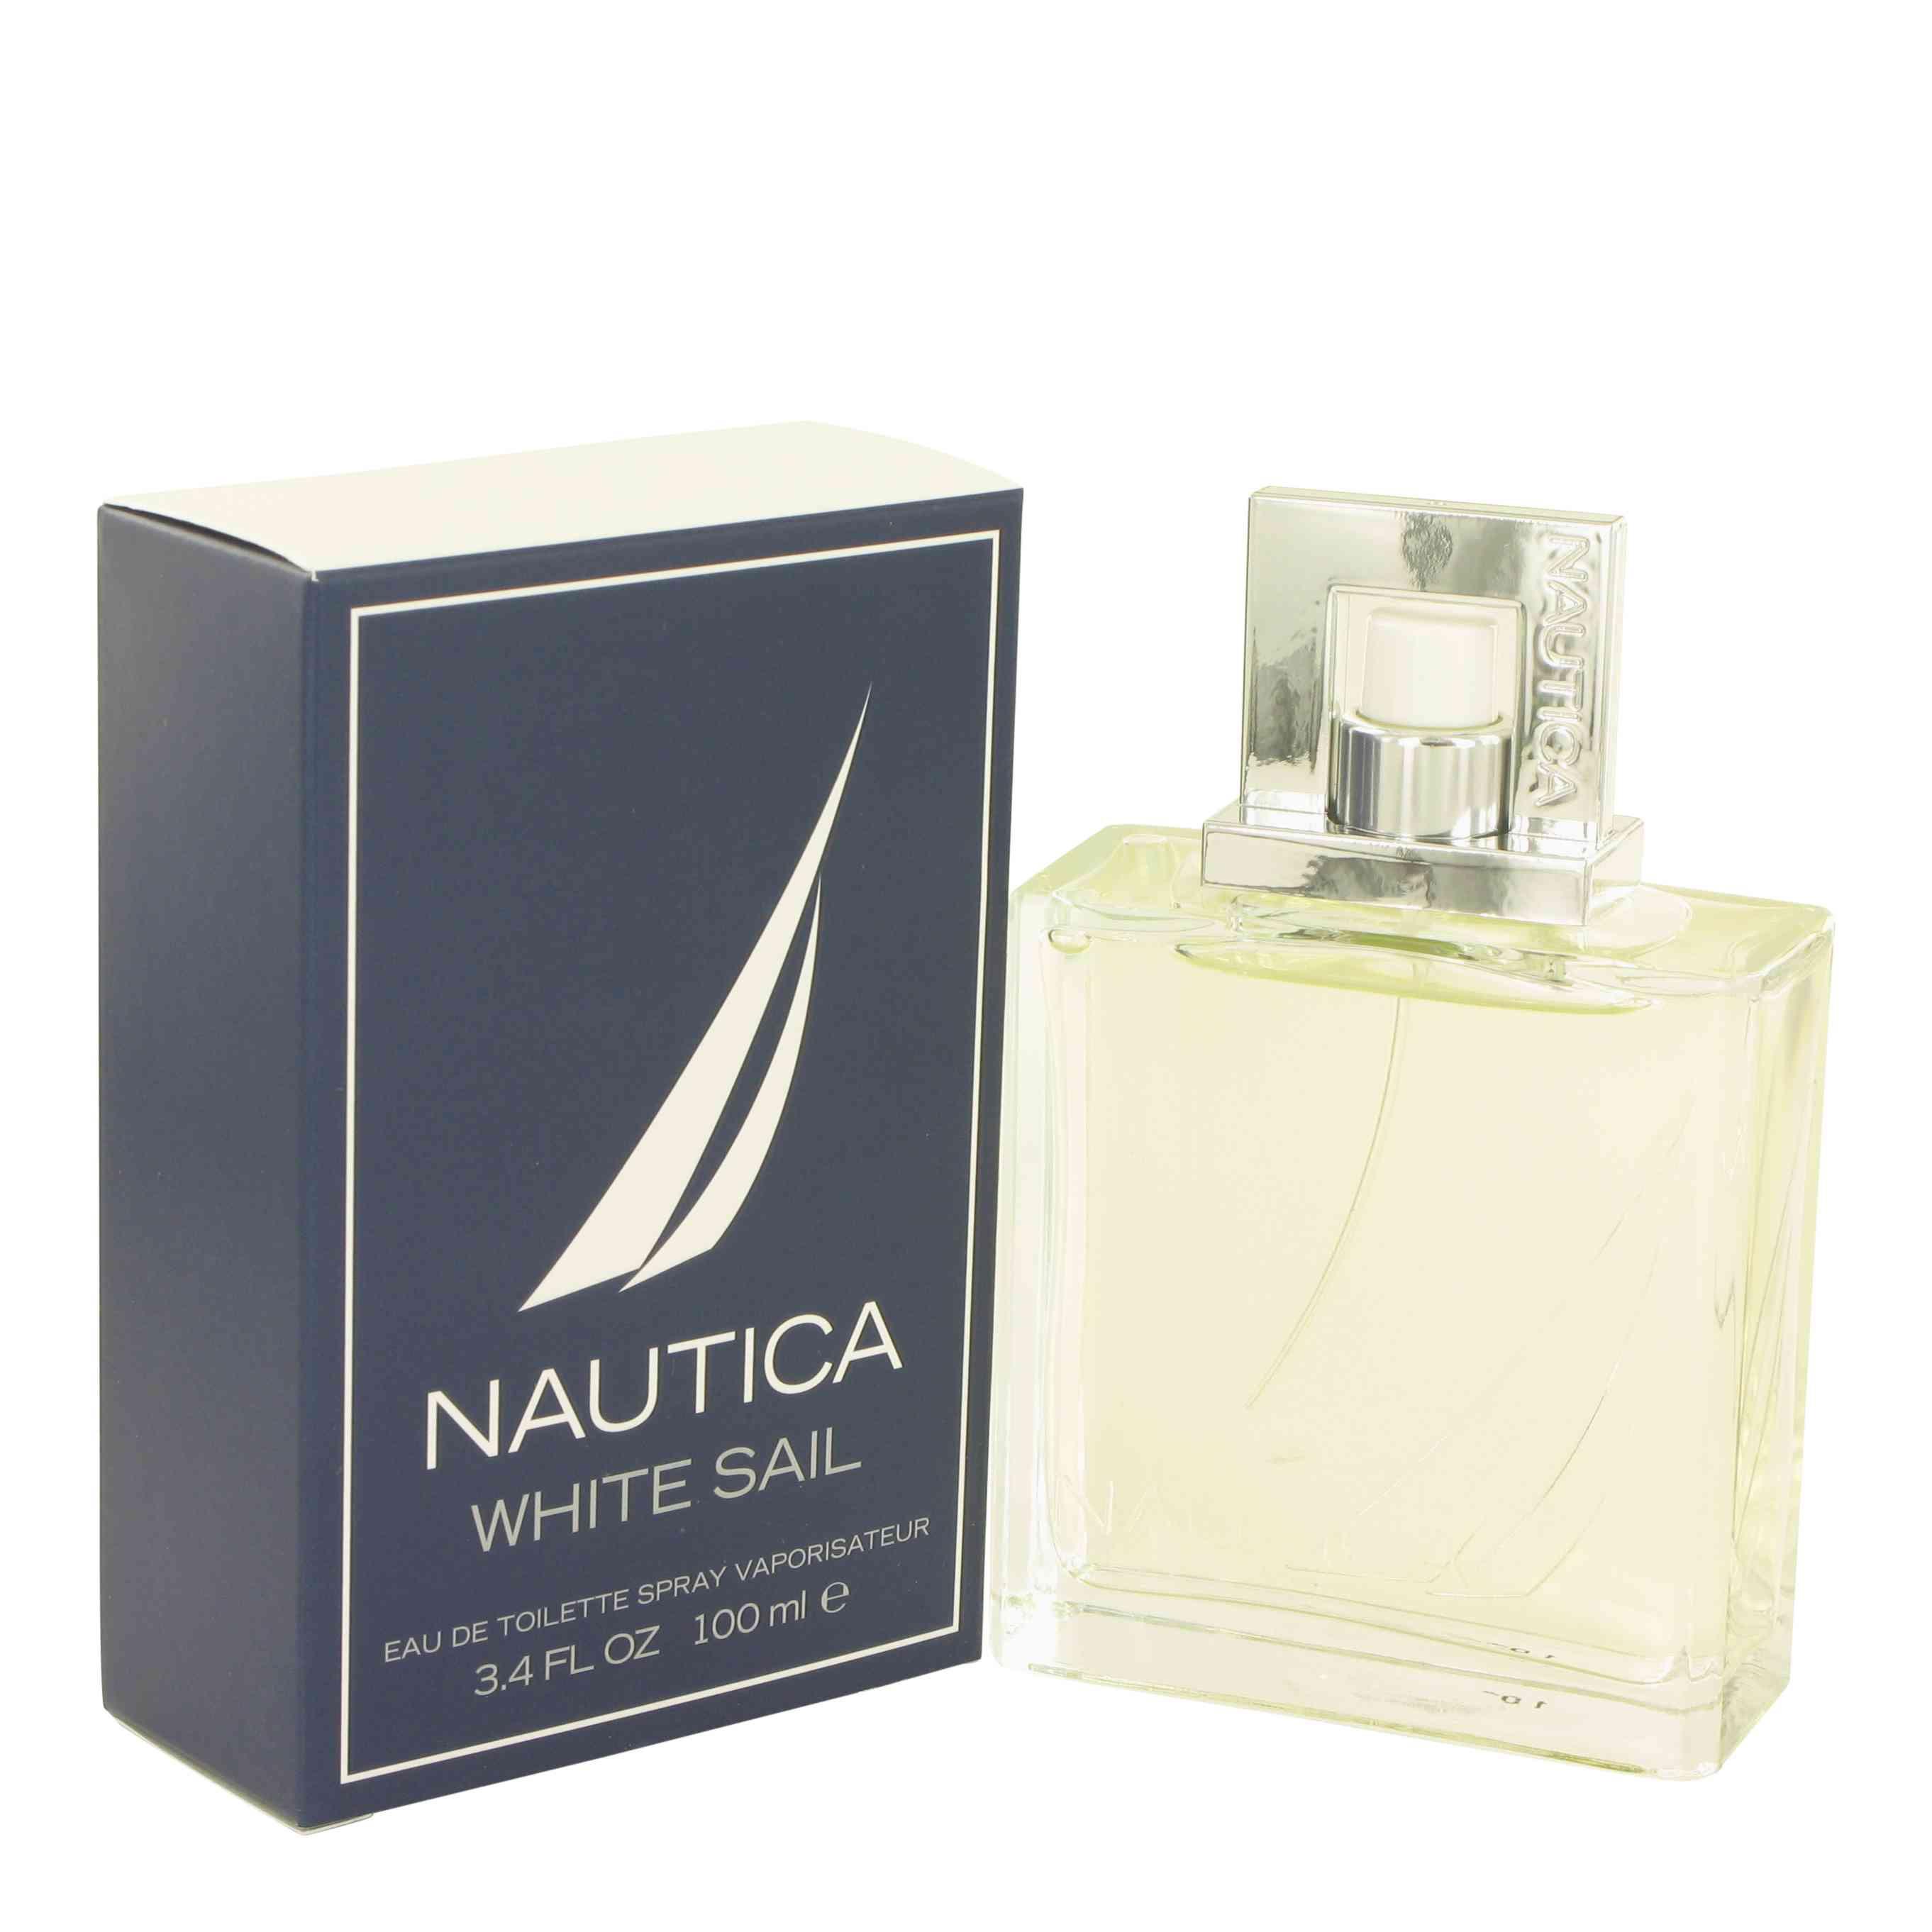 Nautica White Sail аромат для мужчин